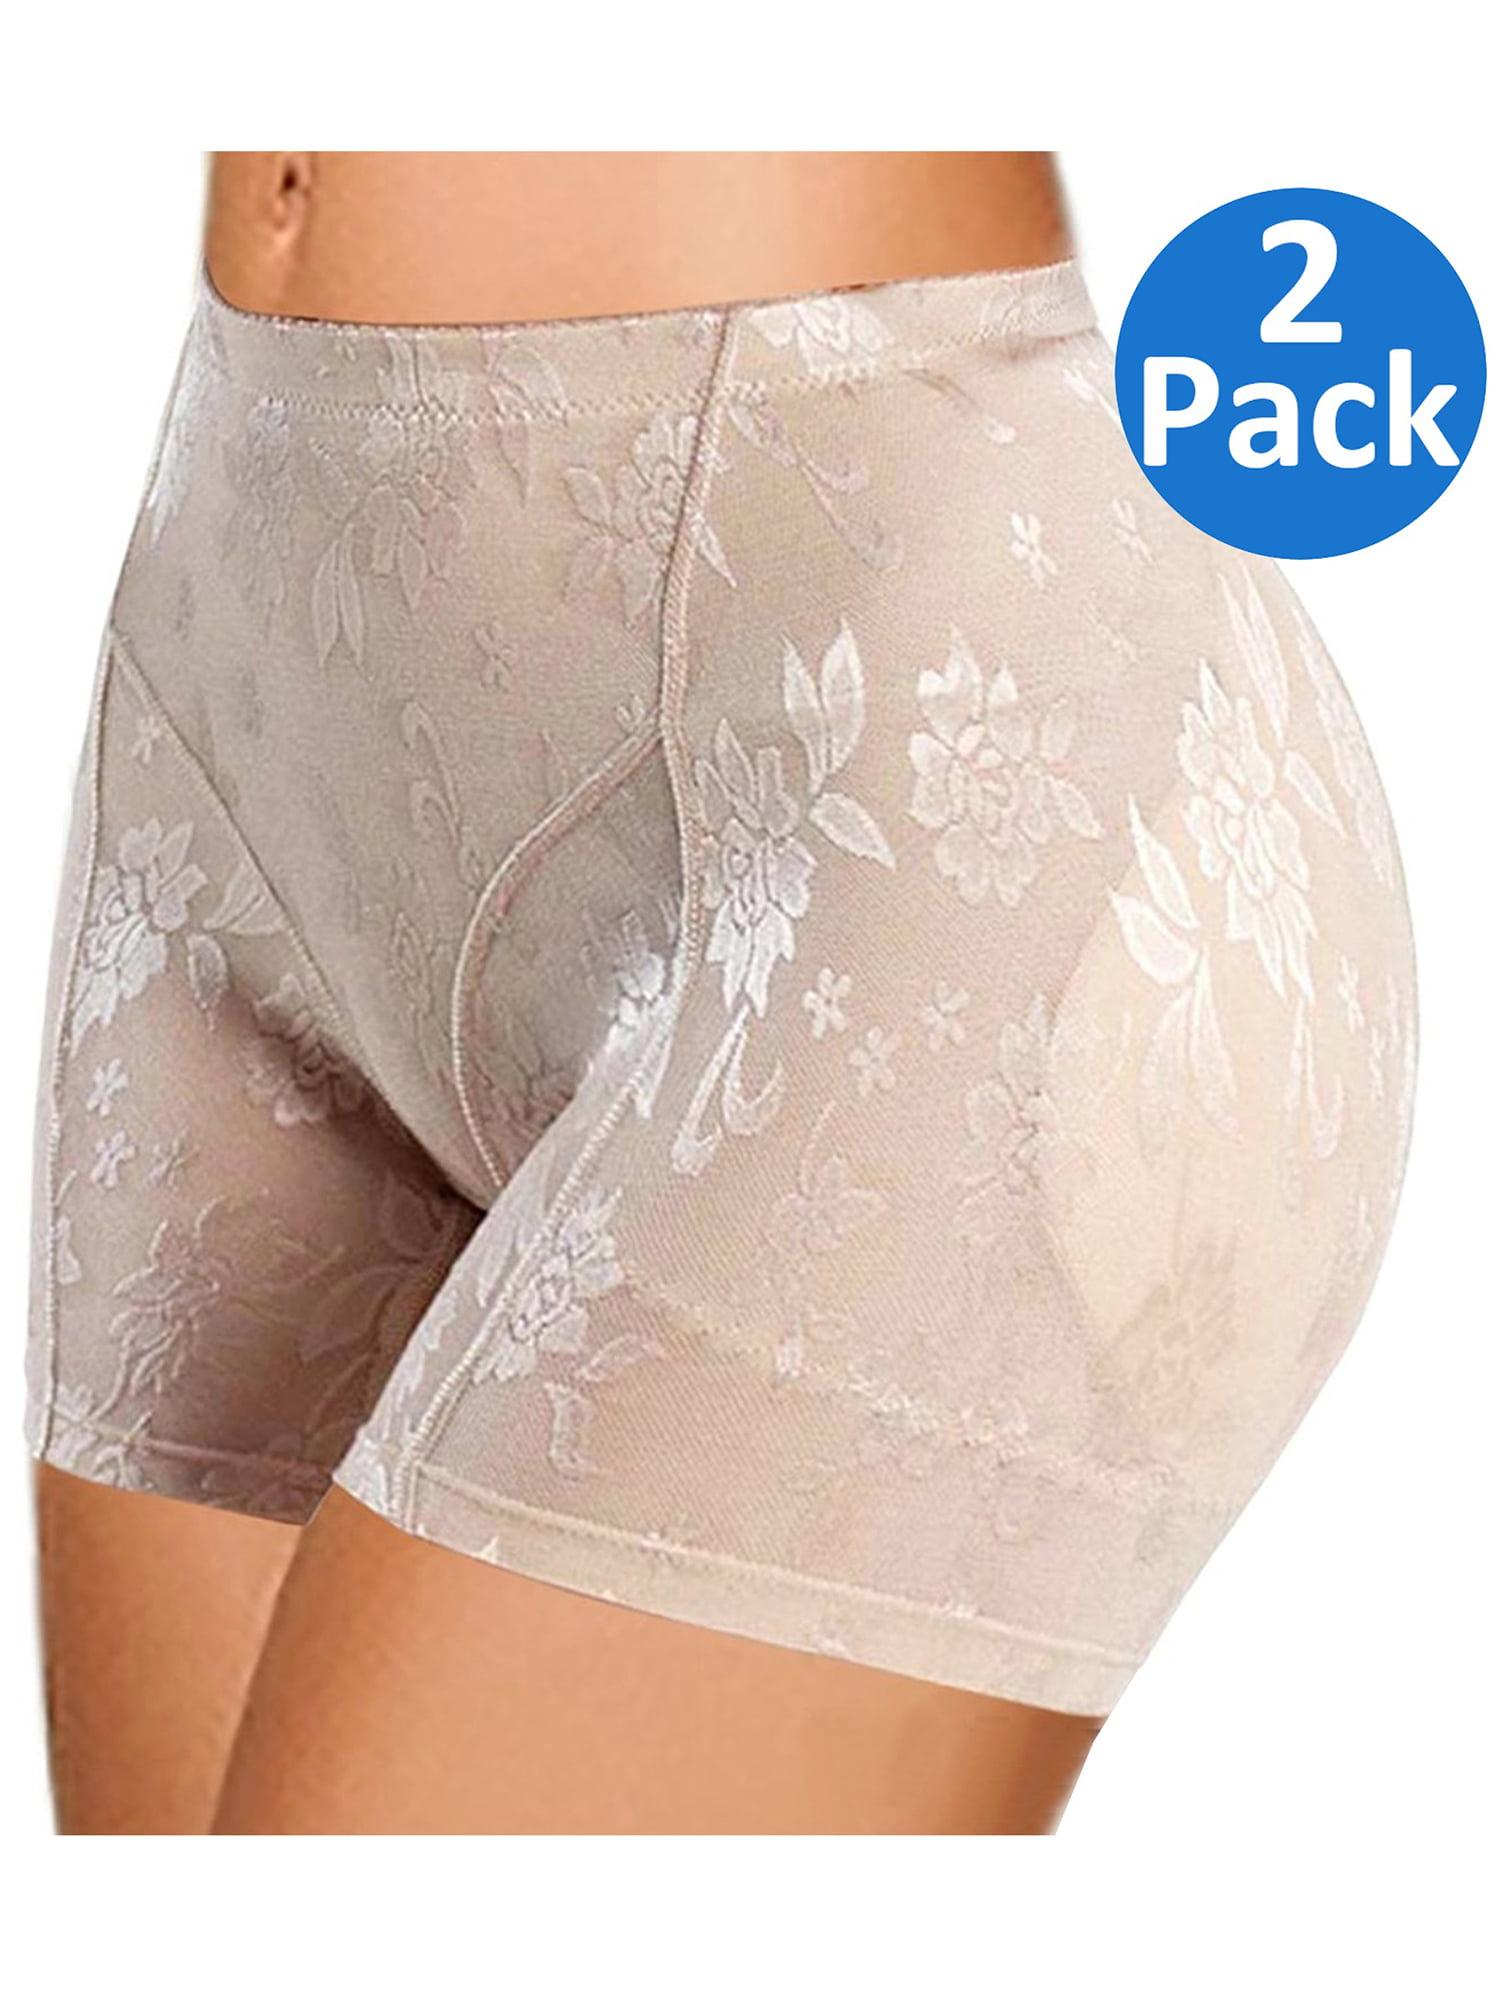 ce2bd234e6f SAYFUT - SAYFUT Butt Lifter Padded Panty Enhancing Body Shaper for Women  Shapewear Boyshorts Control Panties